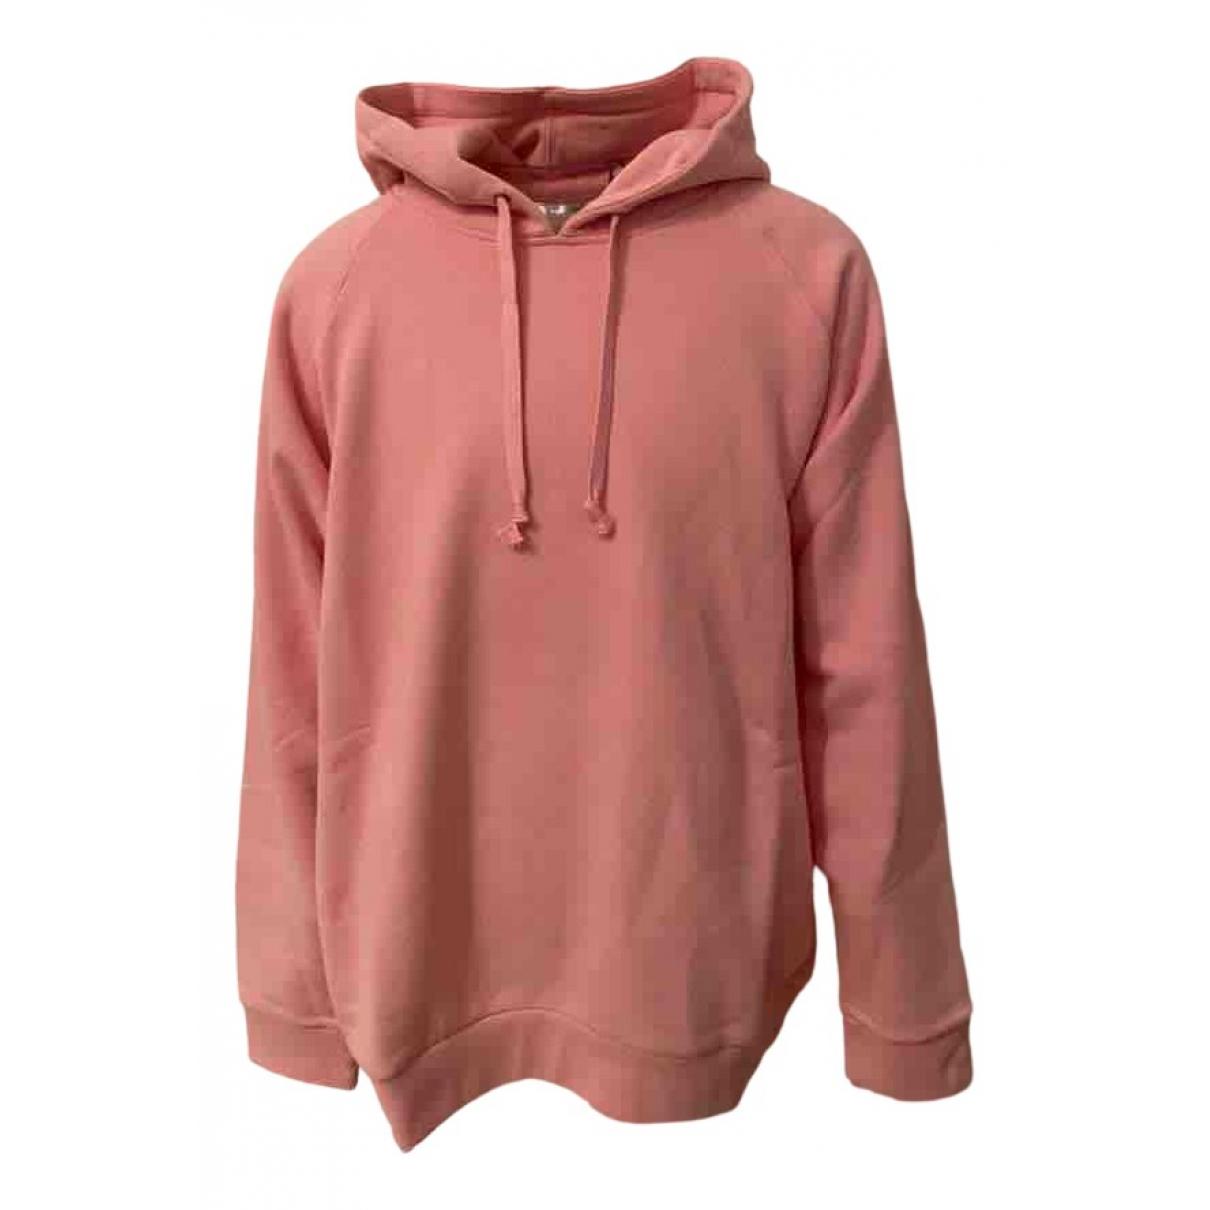 Gucci N Pink Cotton Knitwear & Sweatshirts for Men XL International